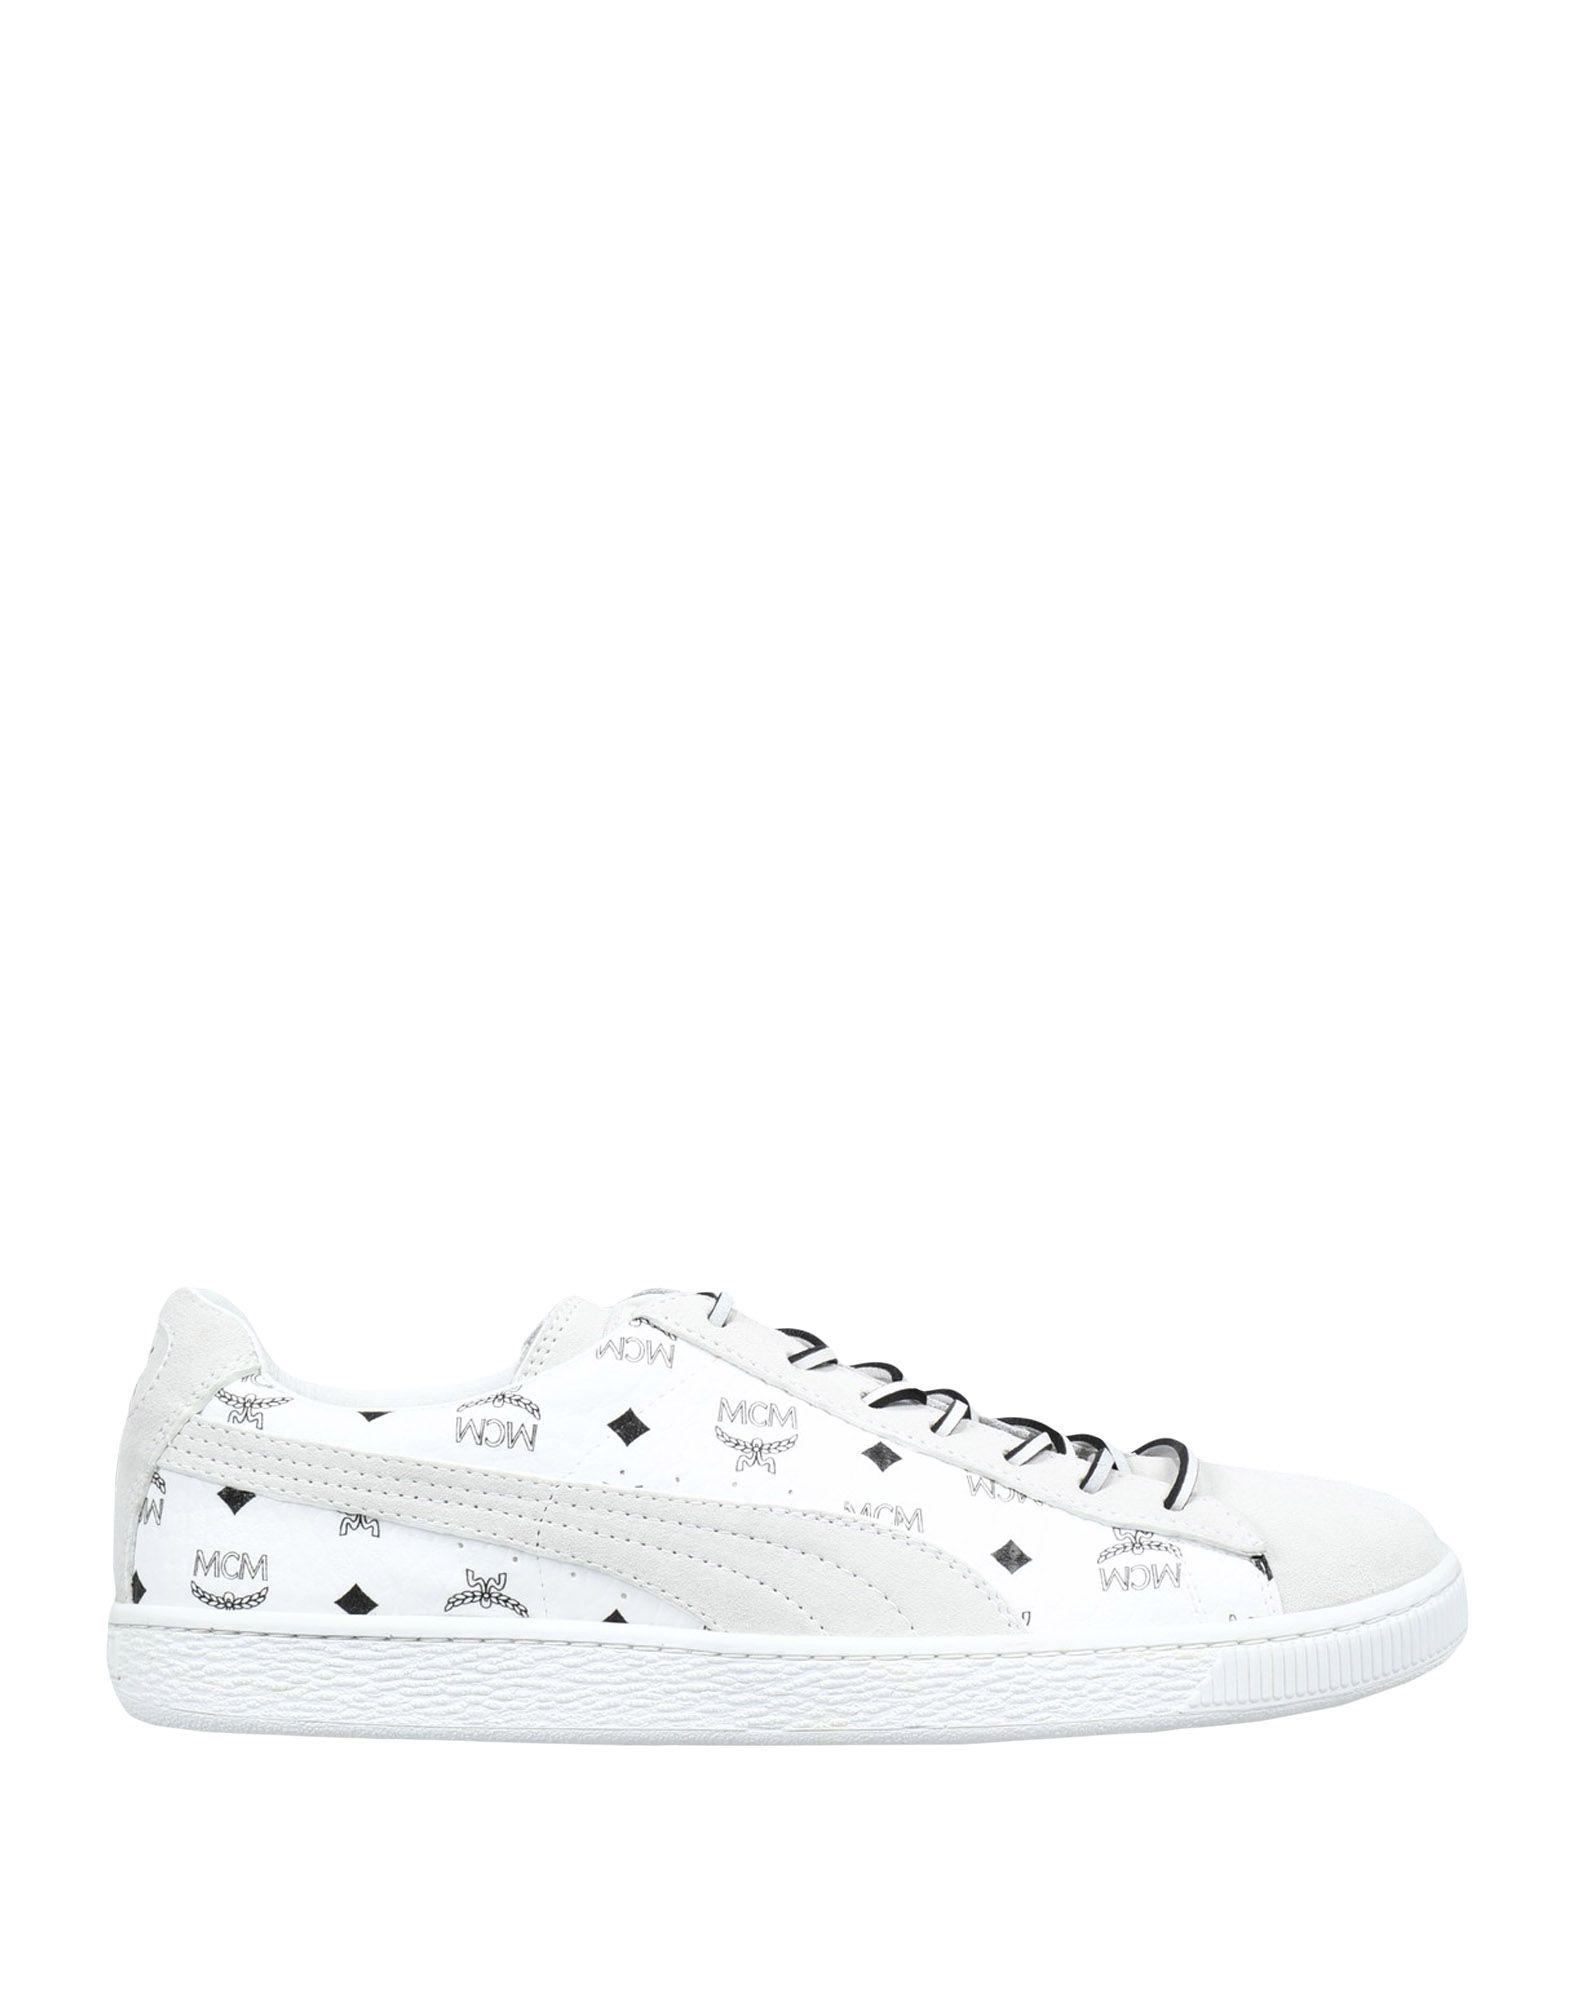 Sneakers Puma X Mcm Suede Classic X Mcm - Homme - Sneakers Puma X Mcm  Blanc Remise de marque